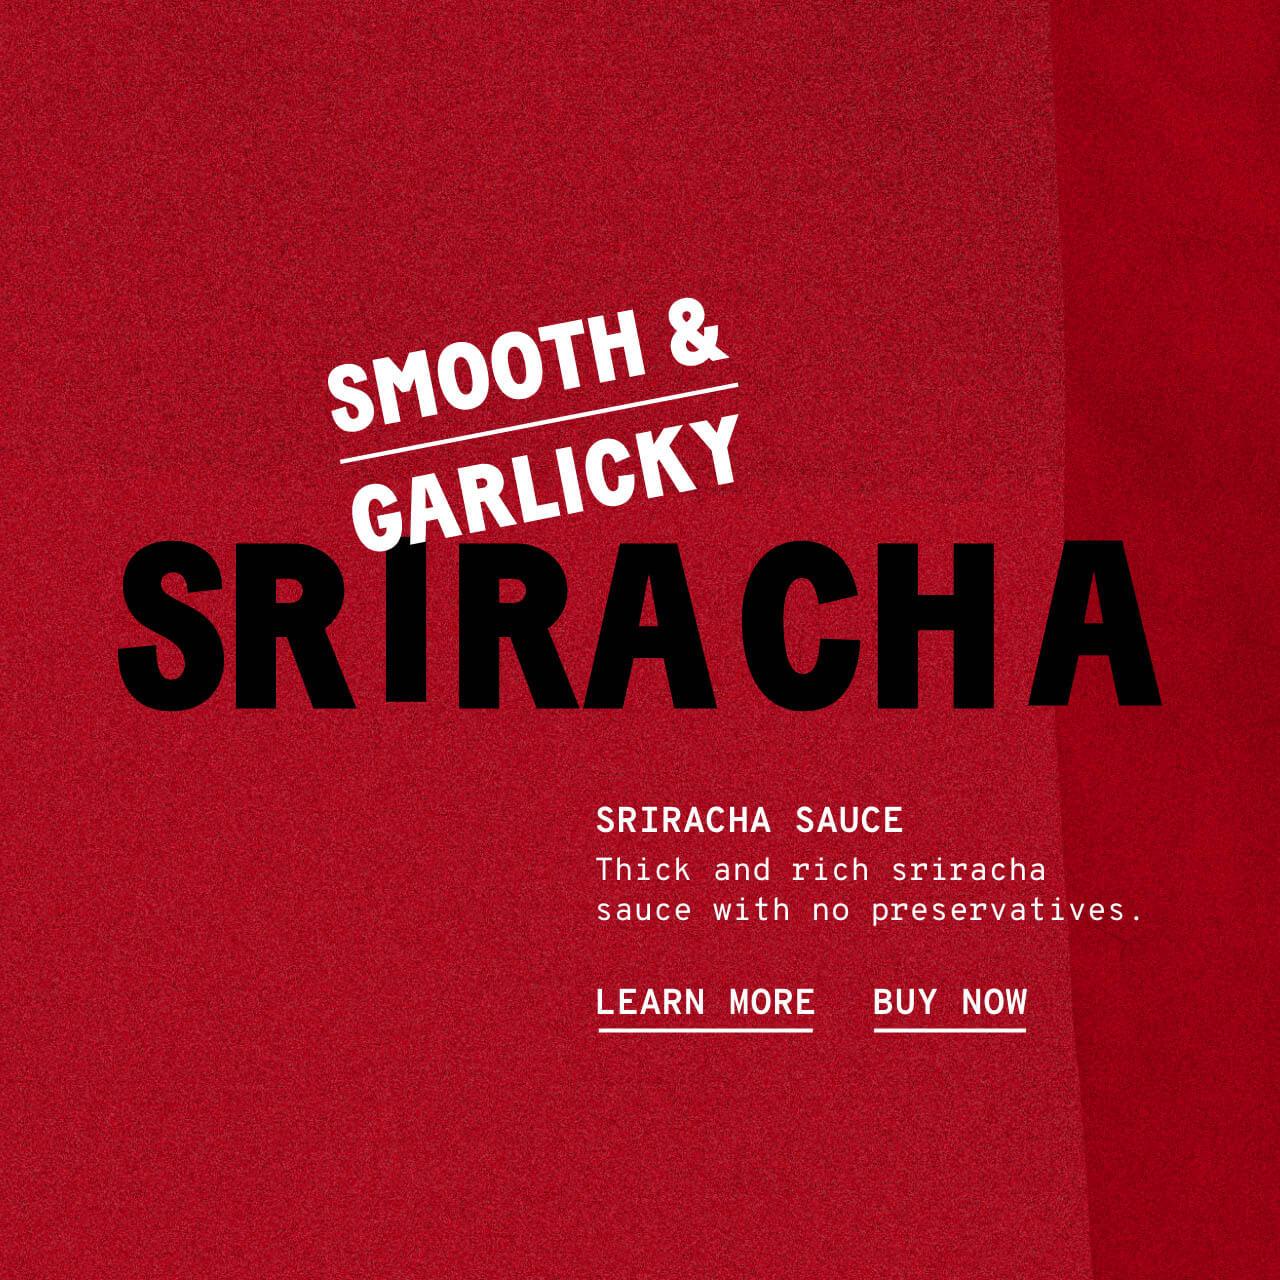 Sriracha Sauce - Description